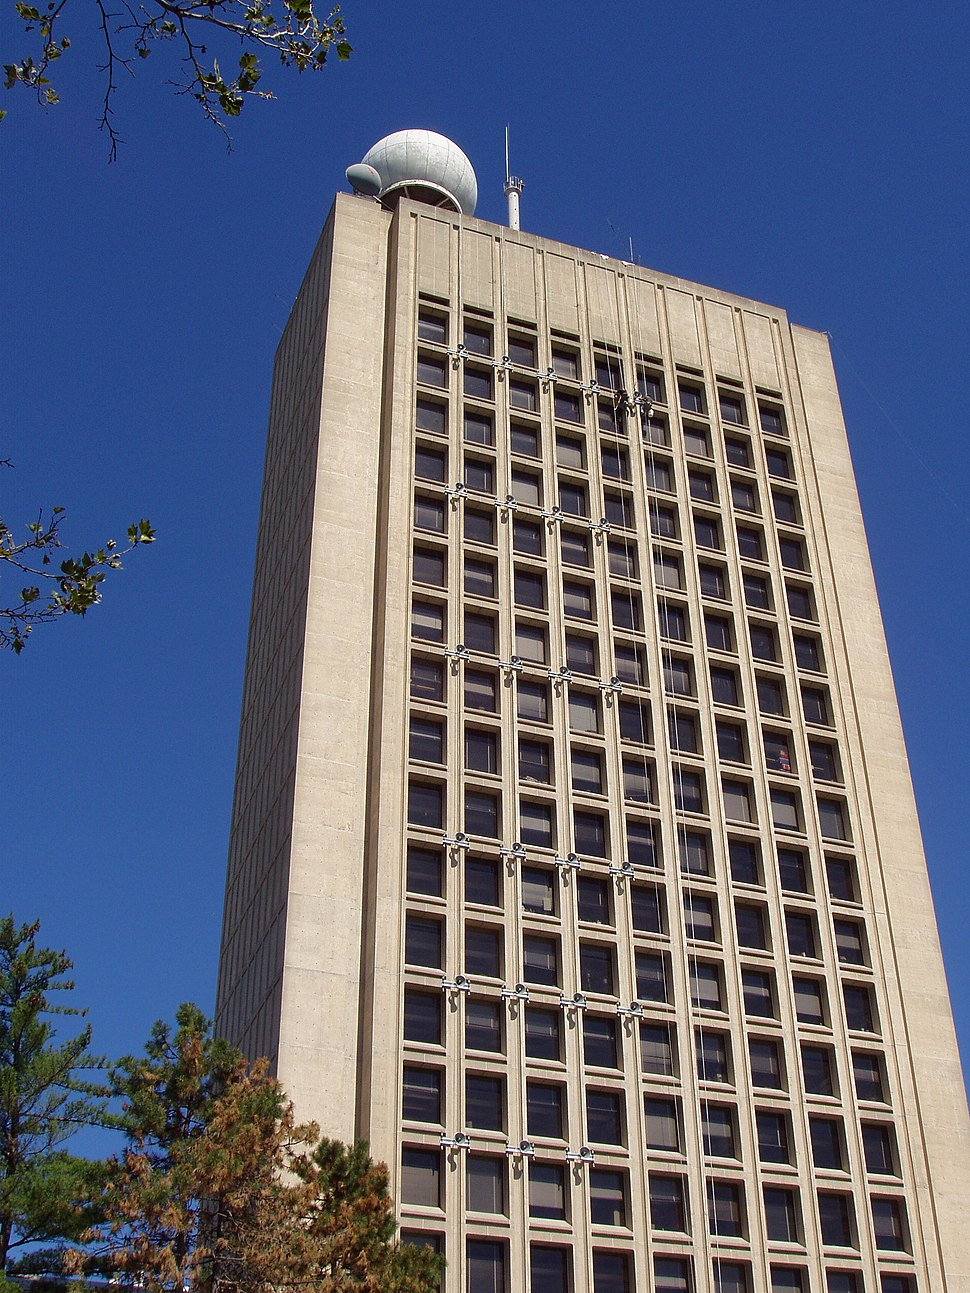 Green Building, MIT, Cambridge, Massachusetts